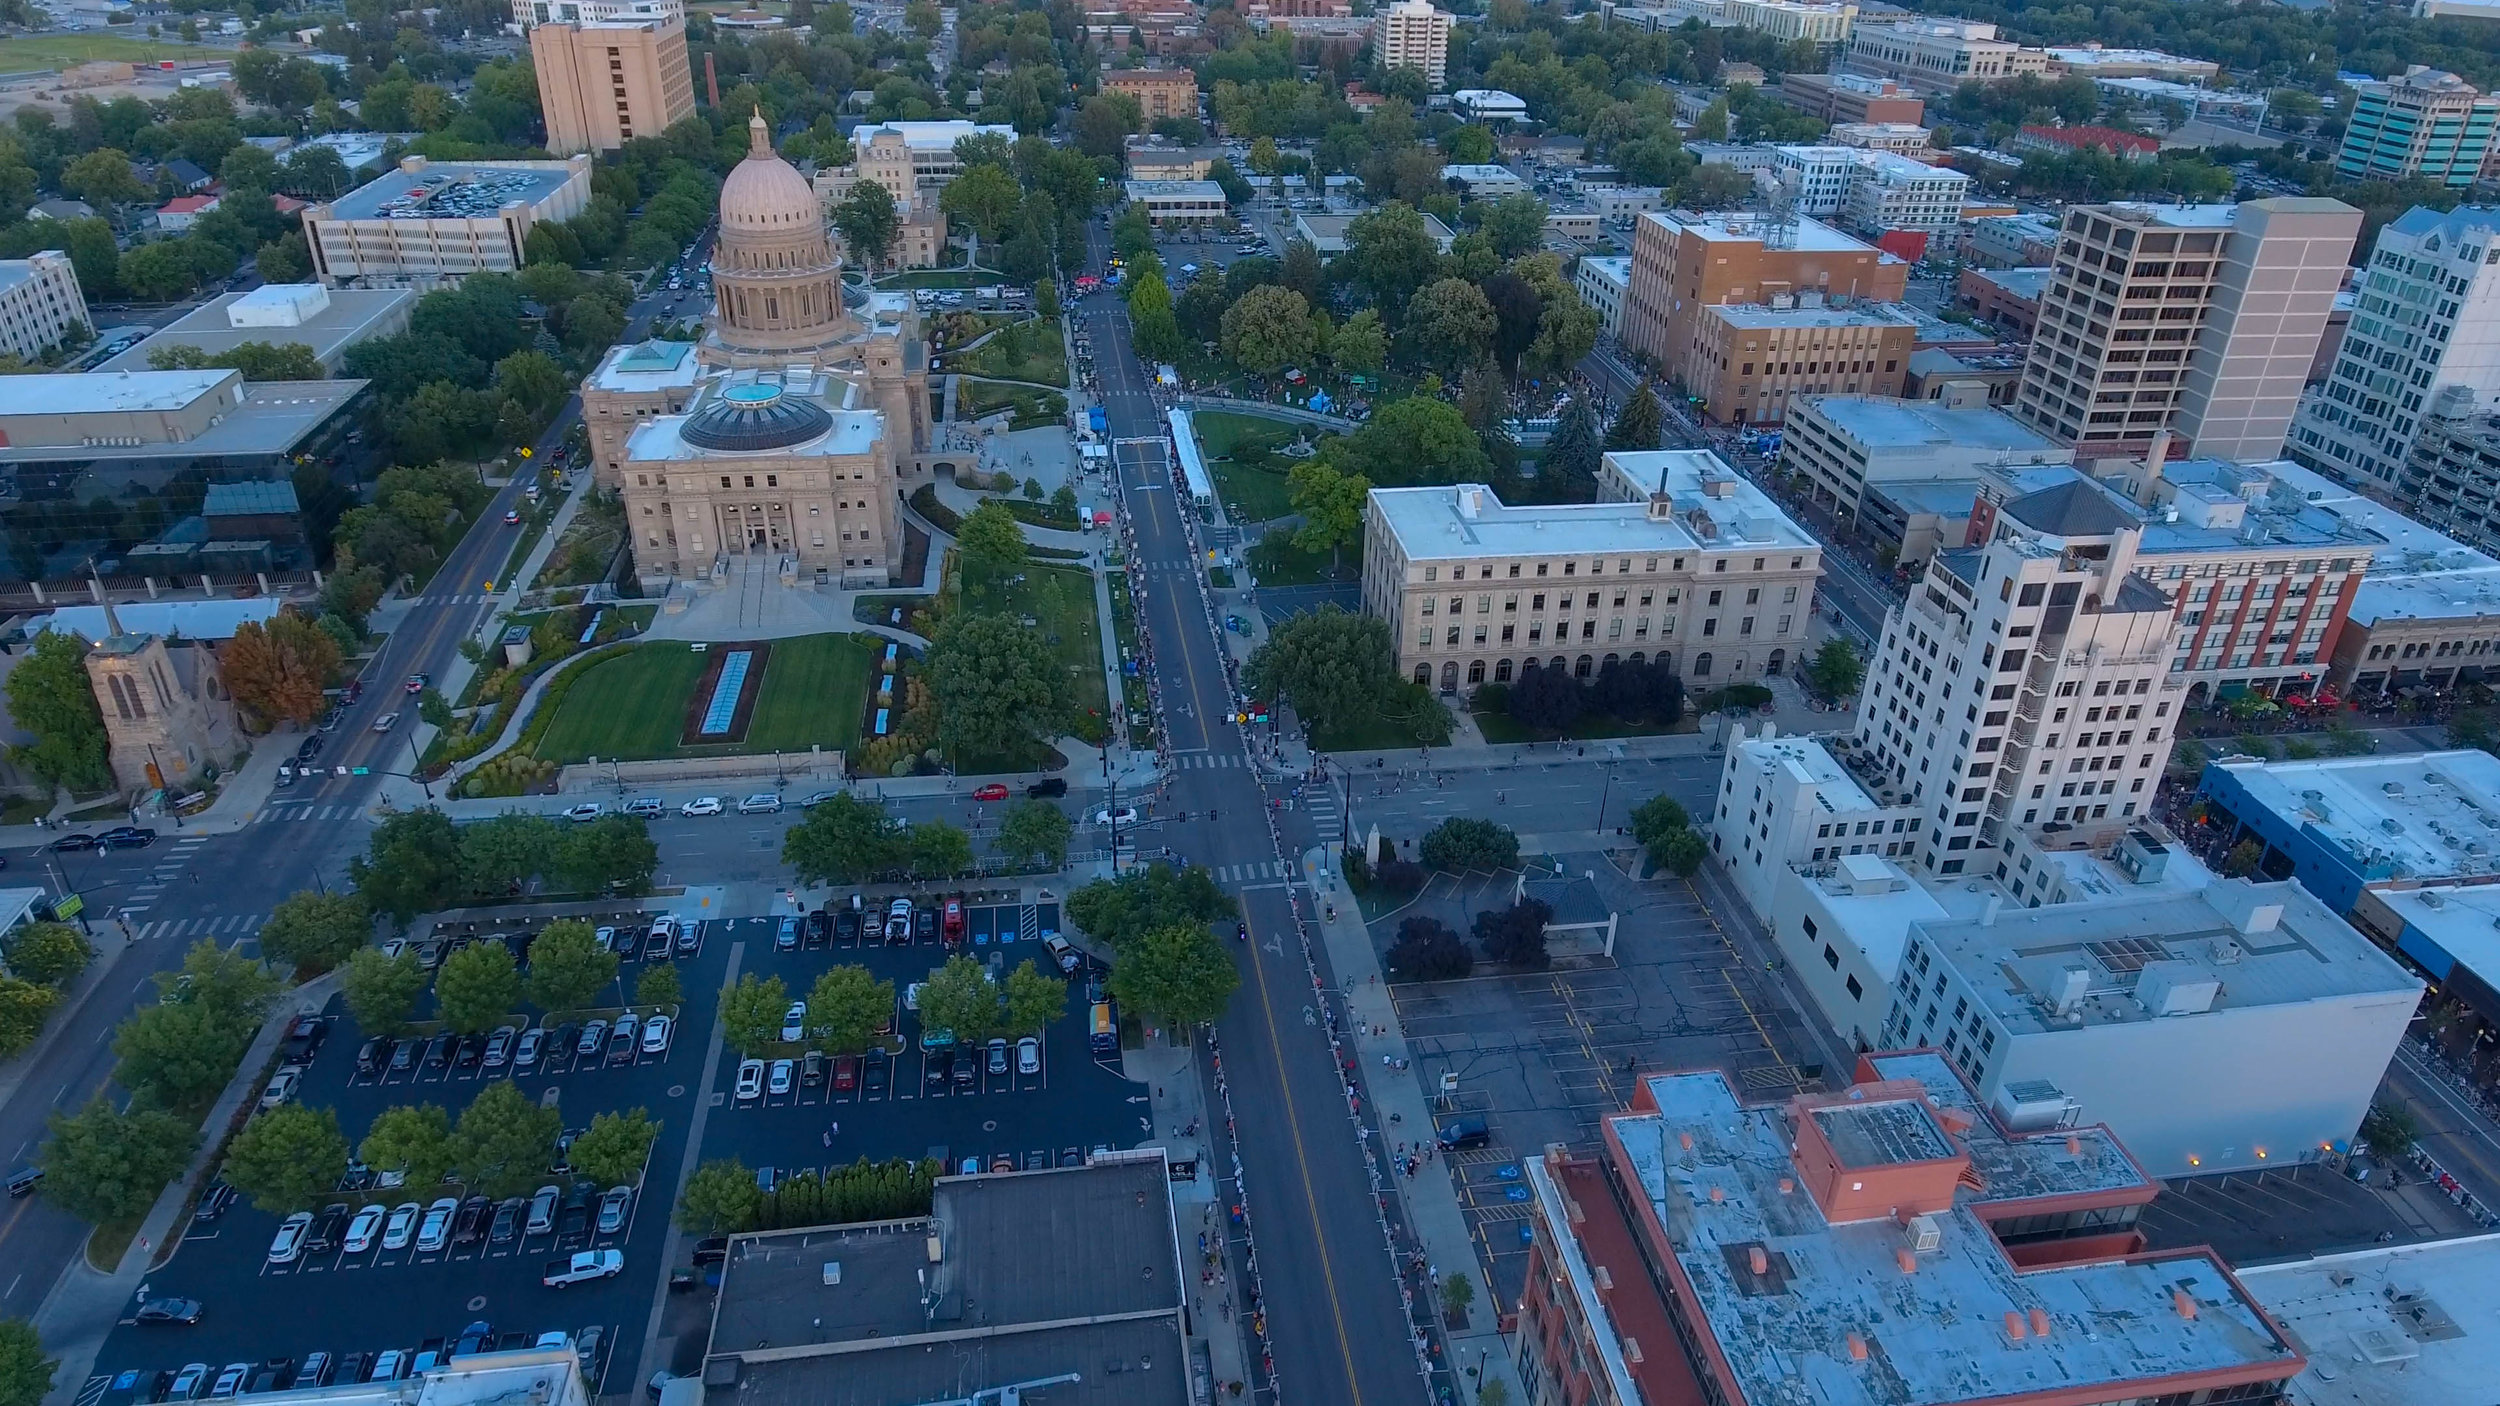 DronePhoto14.jpg